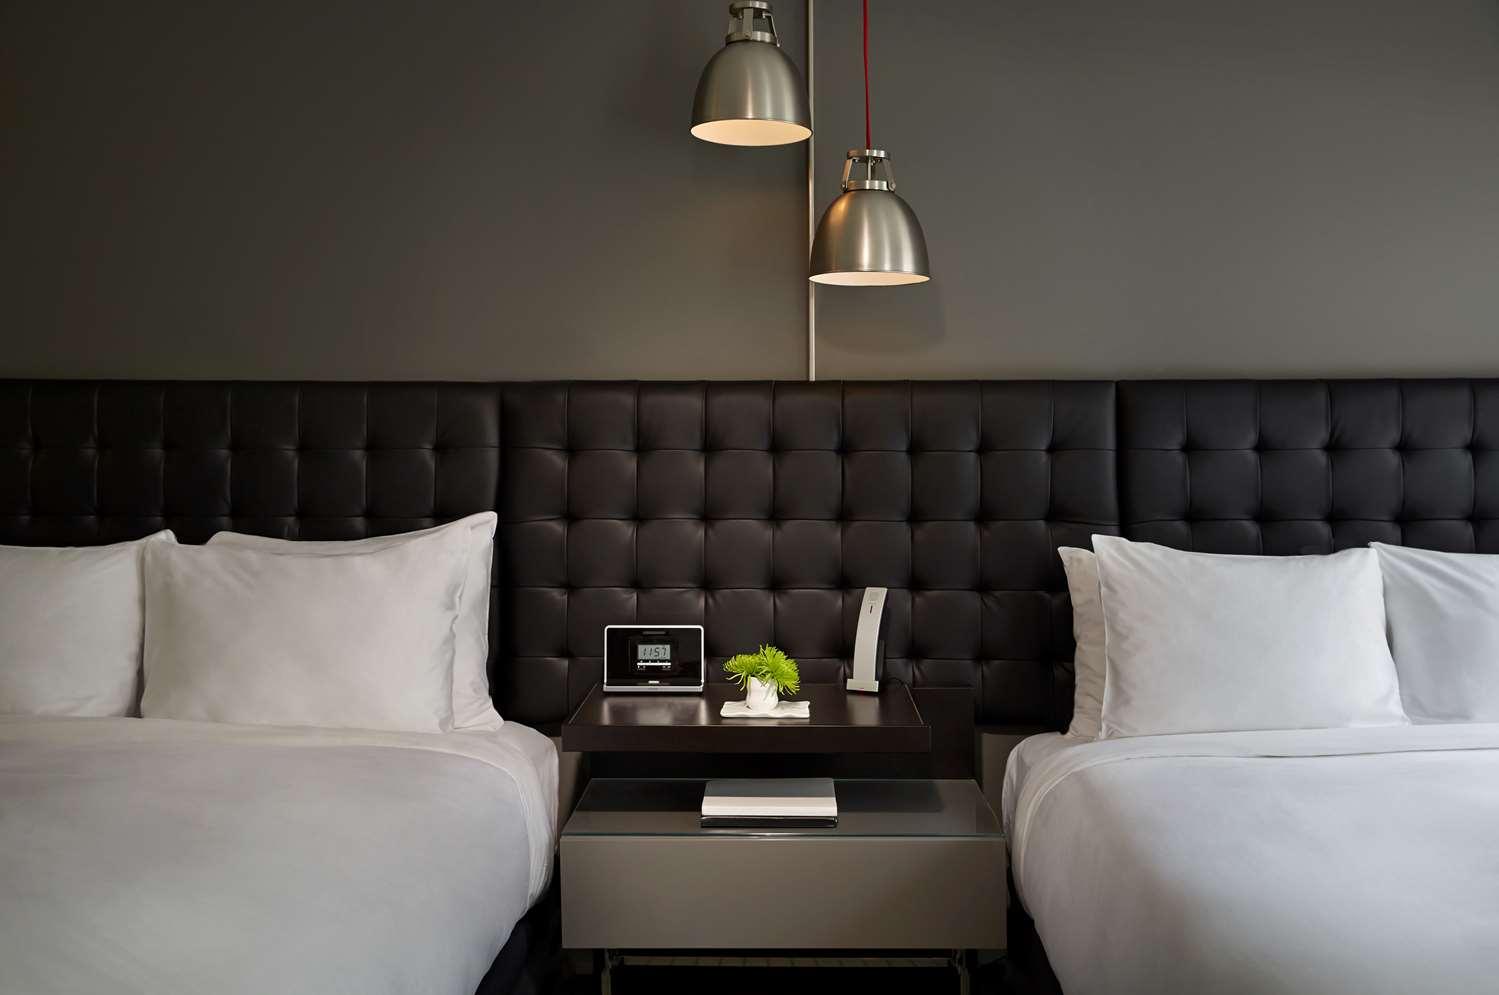 Room - Hotel Zetta San Francisco